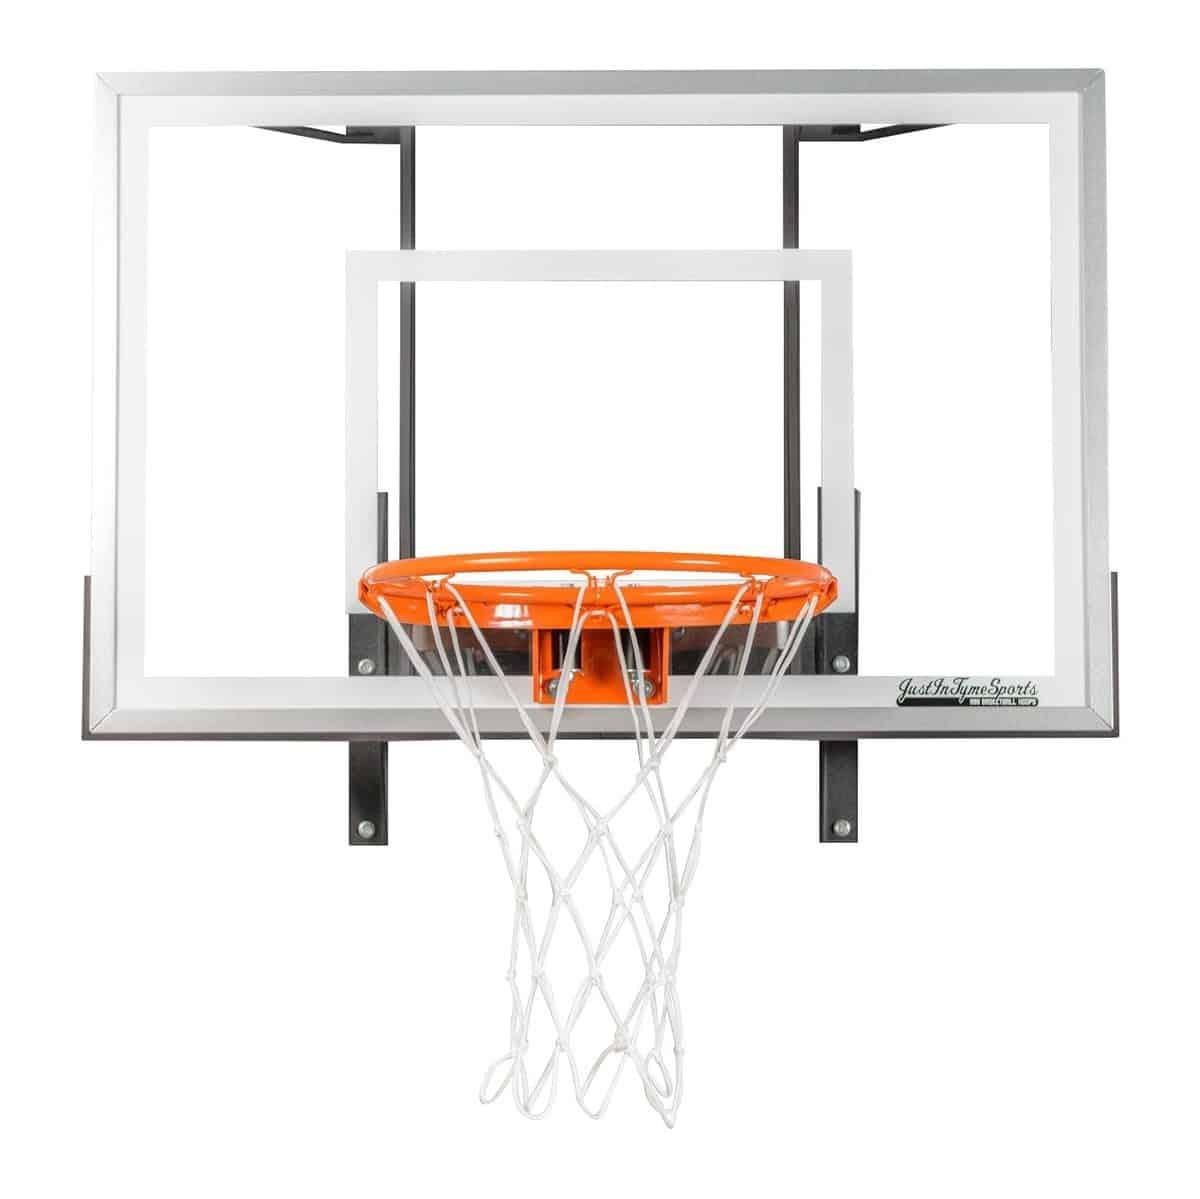 Playroom Basketball Hoop